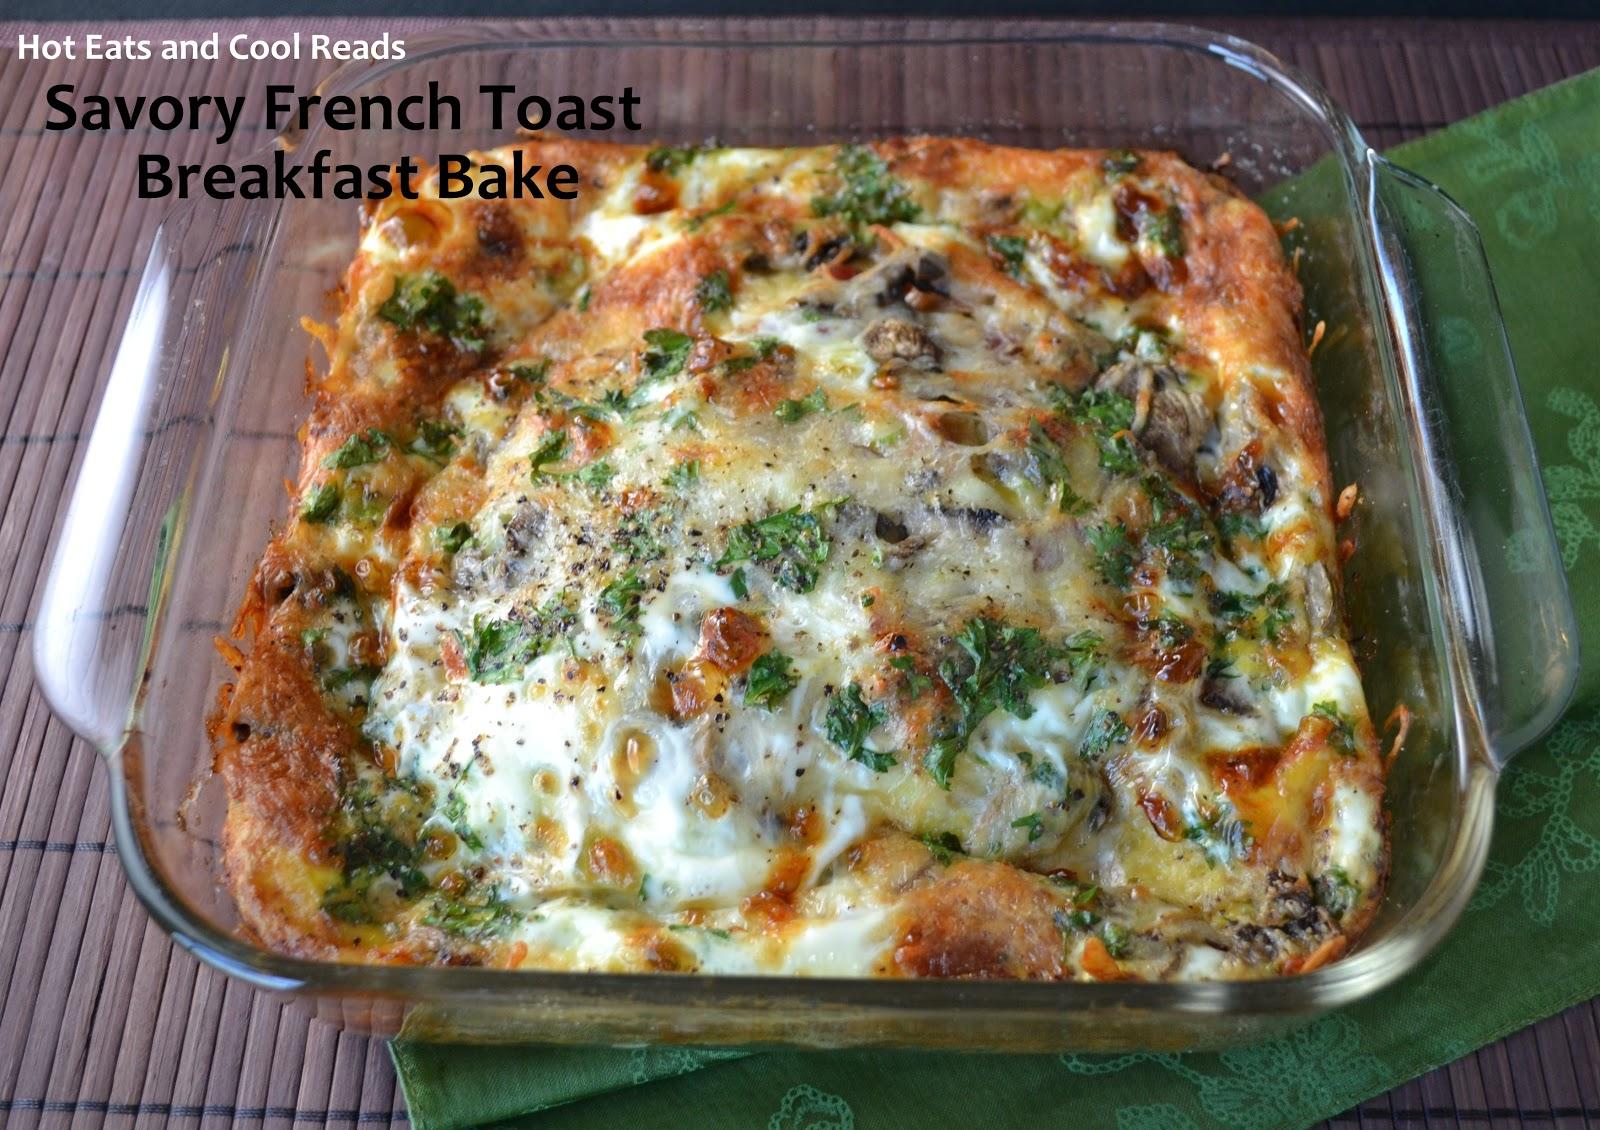 savory french toast breakfast bake recipe - Halloween Casserole Recipe Ideas